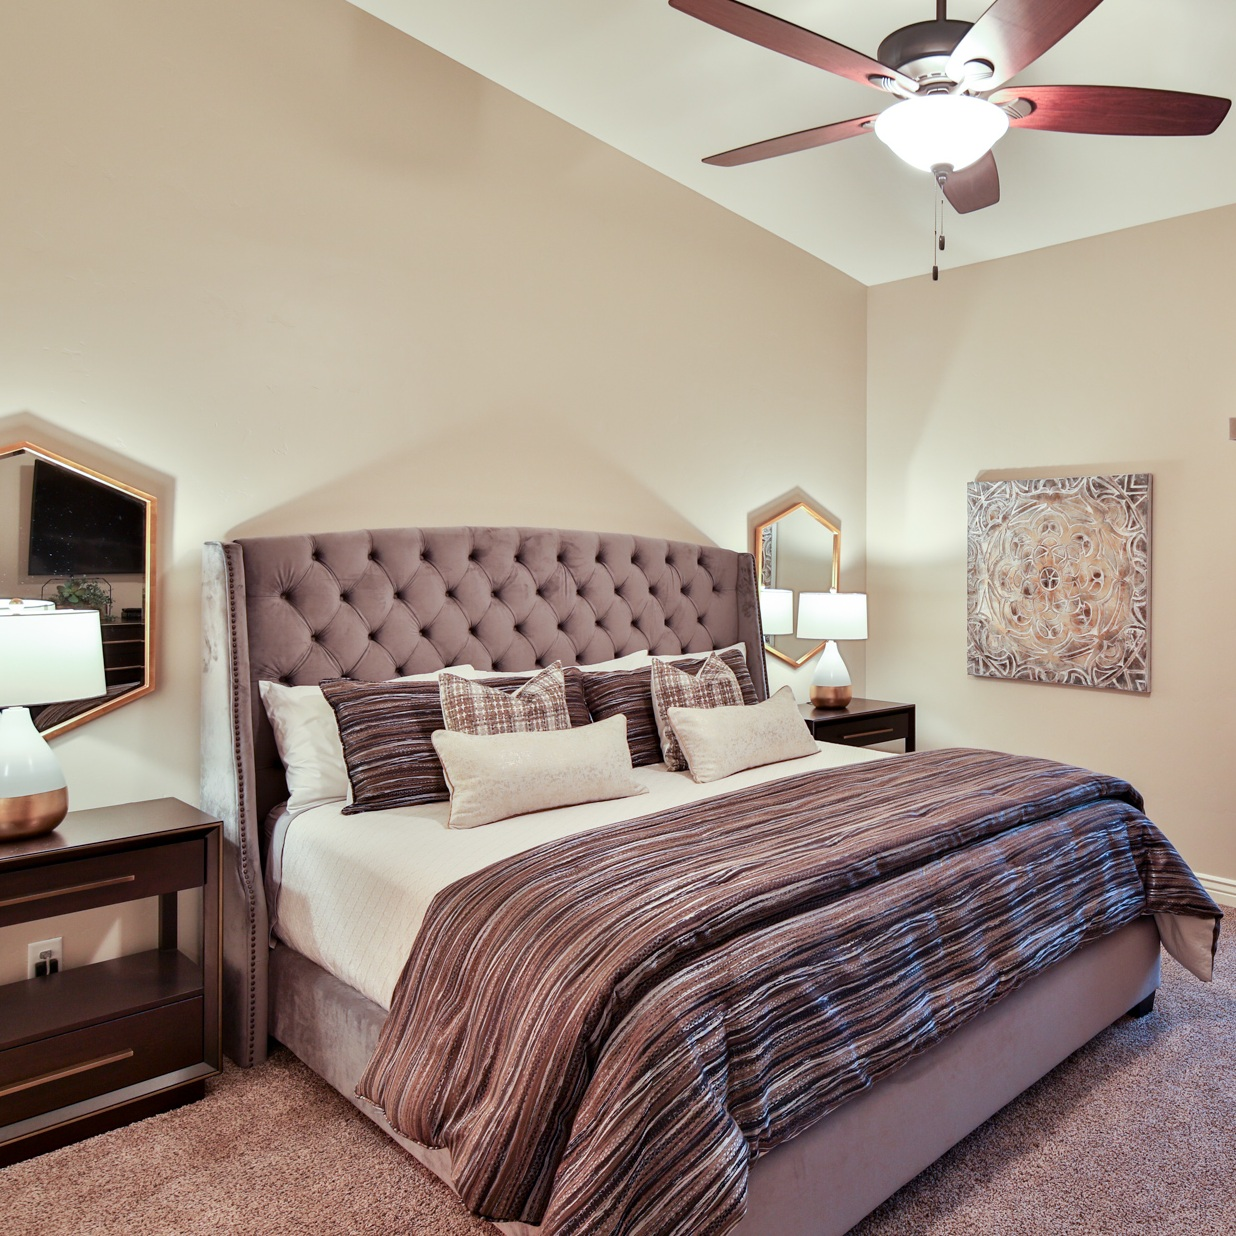 bedding selection -